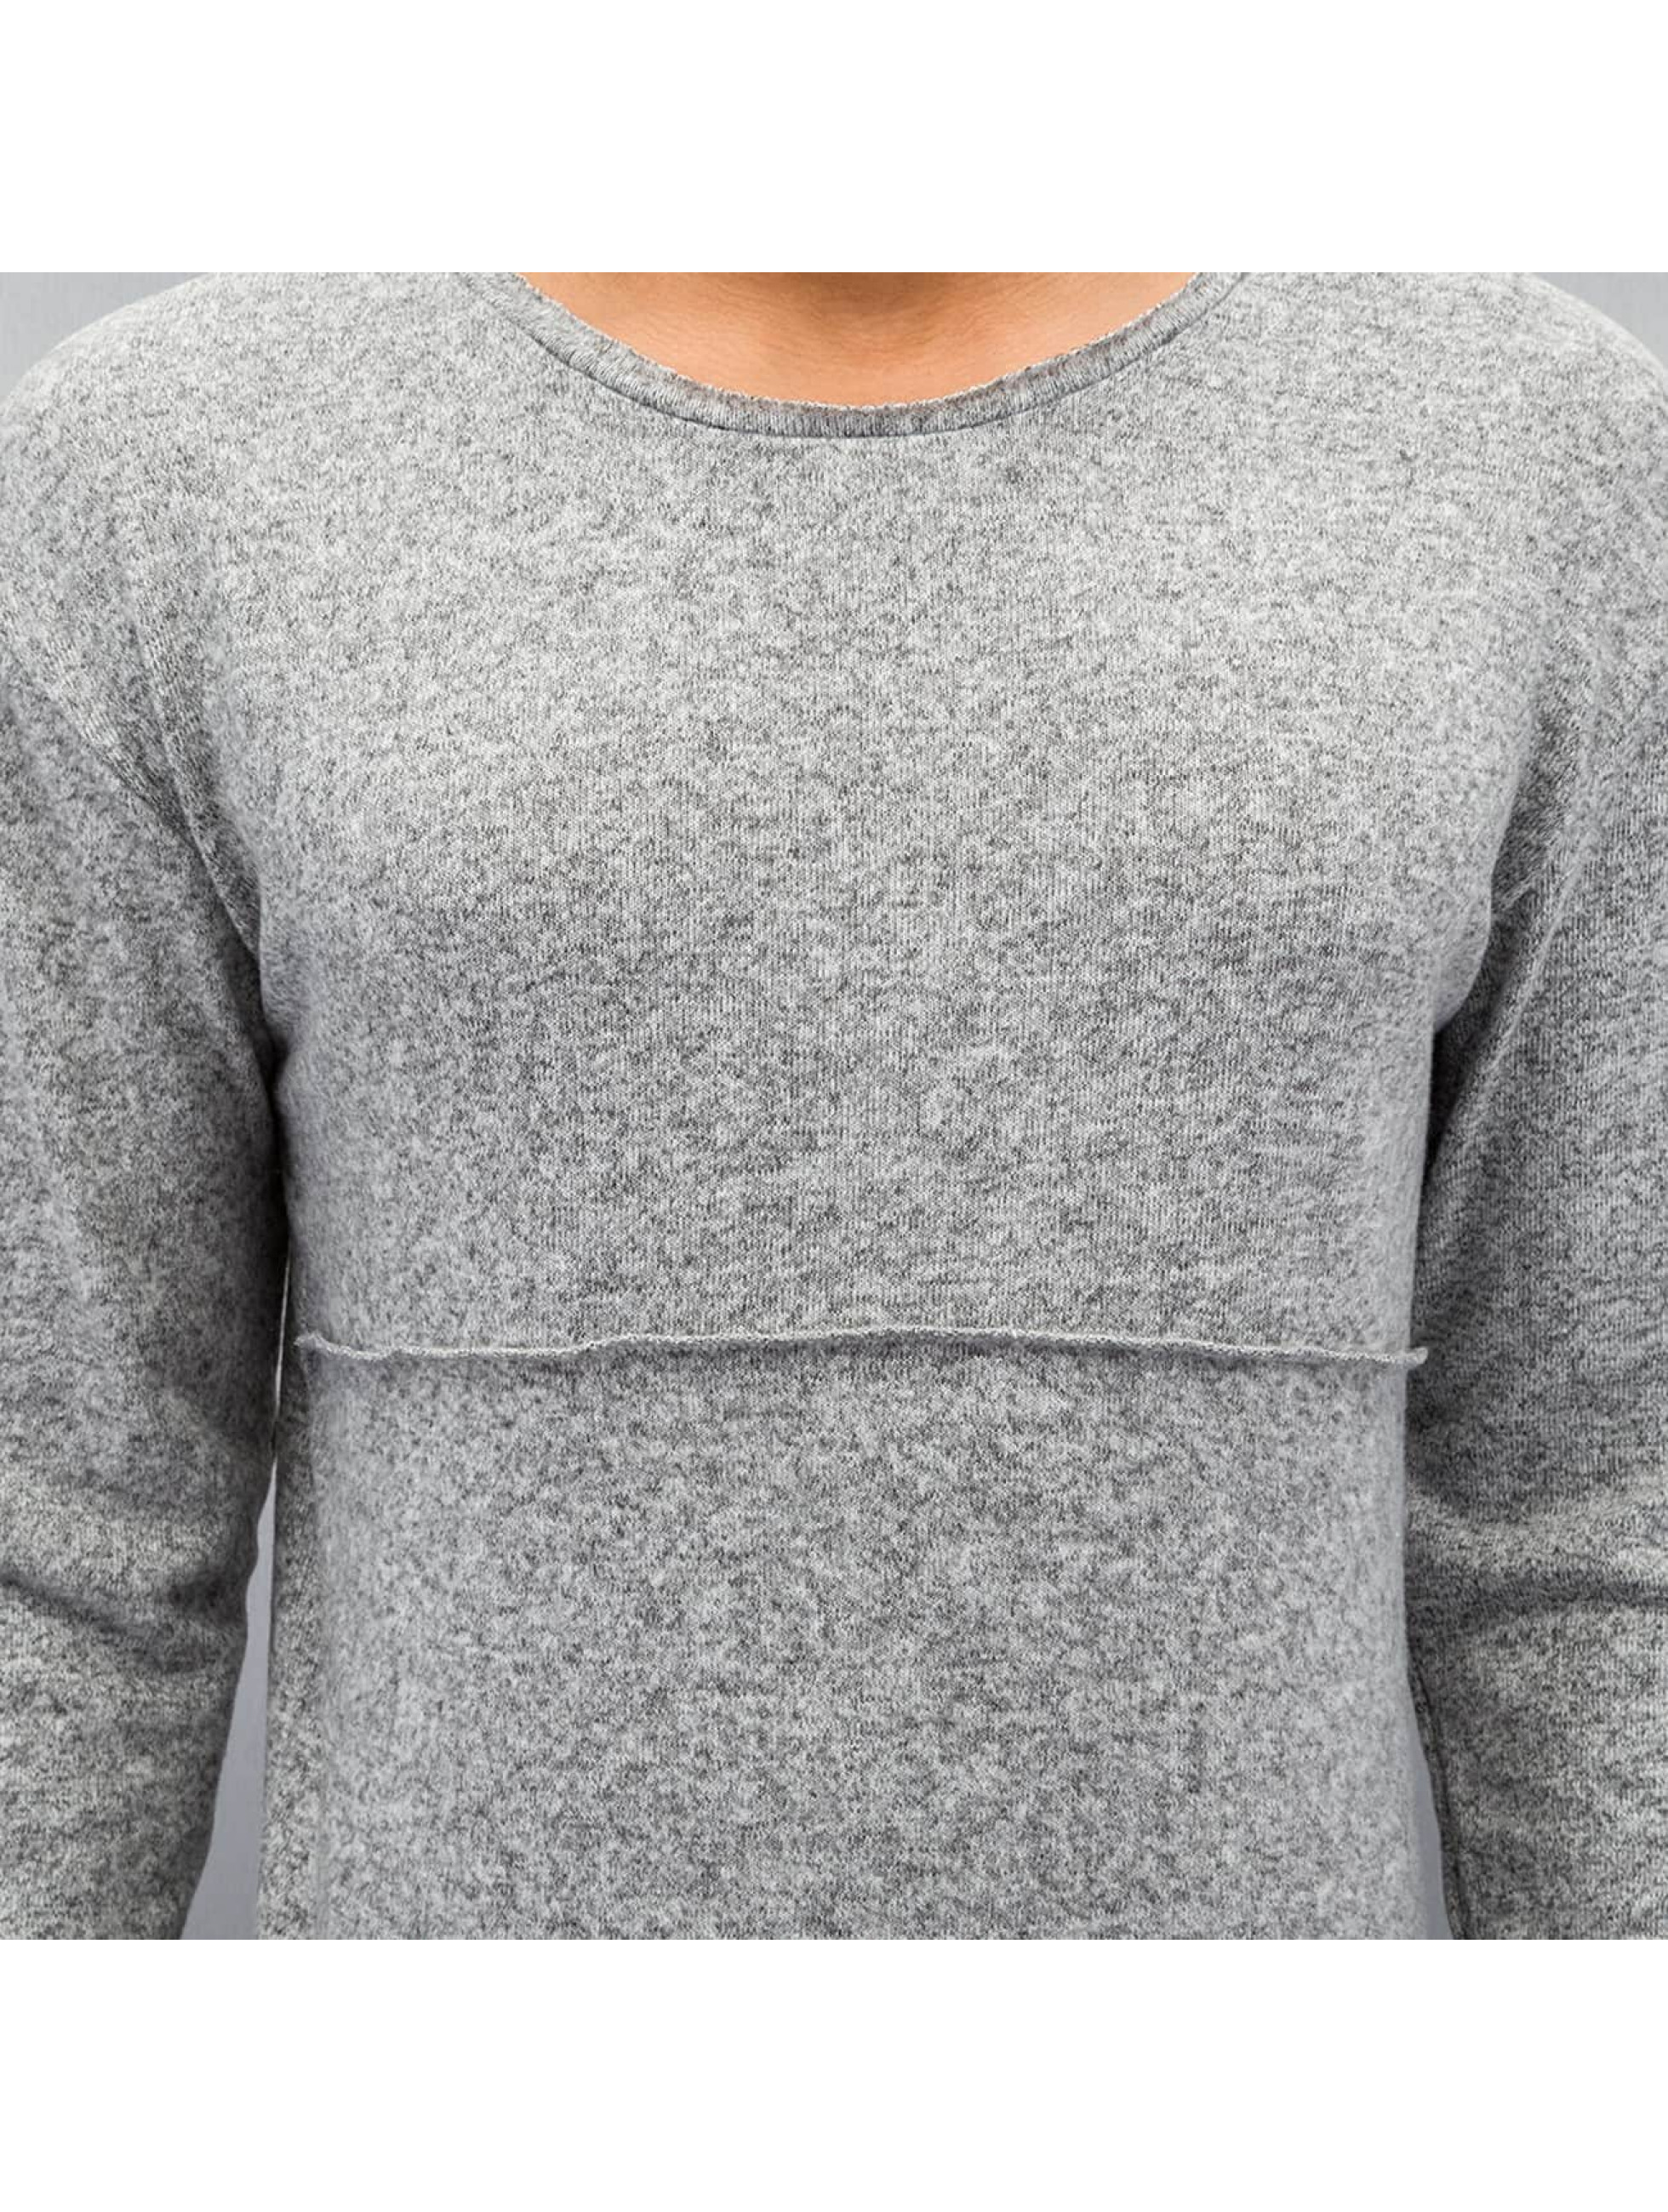 DEF Pitkähihaiset paidat Soft harmaa